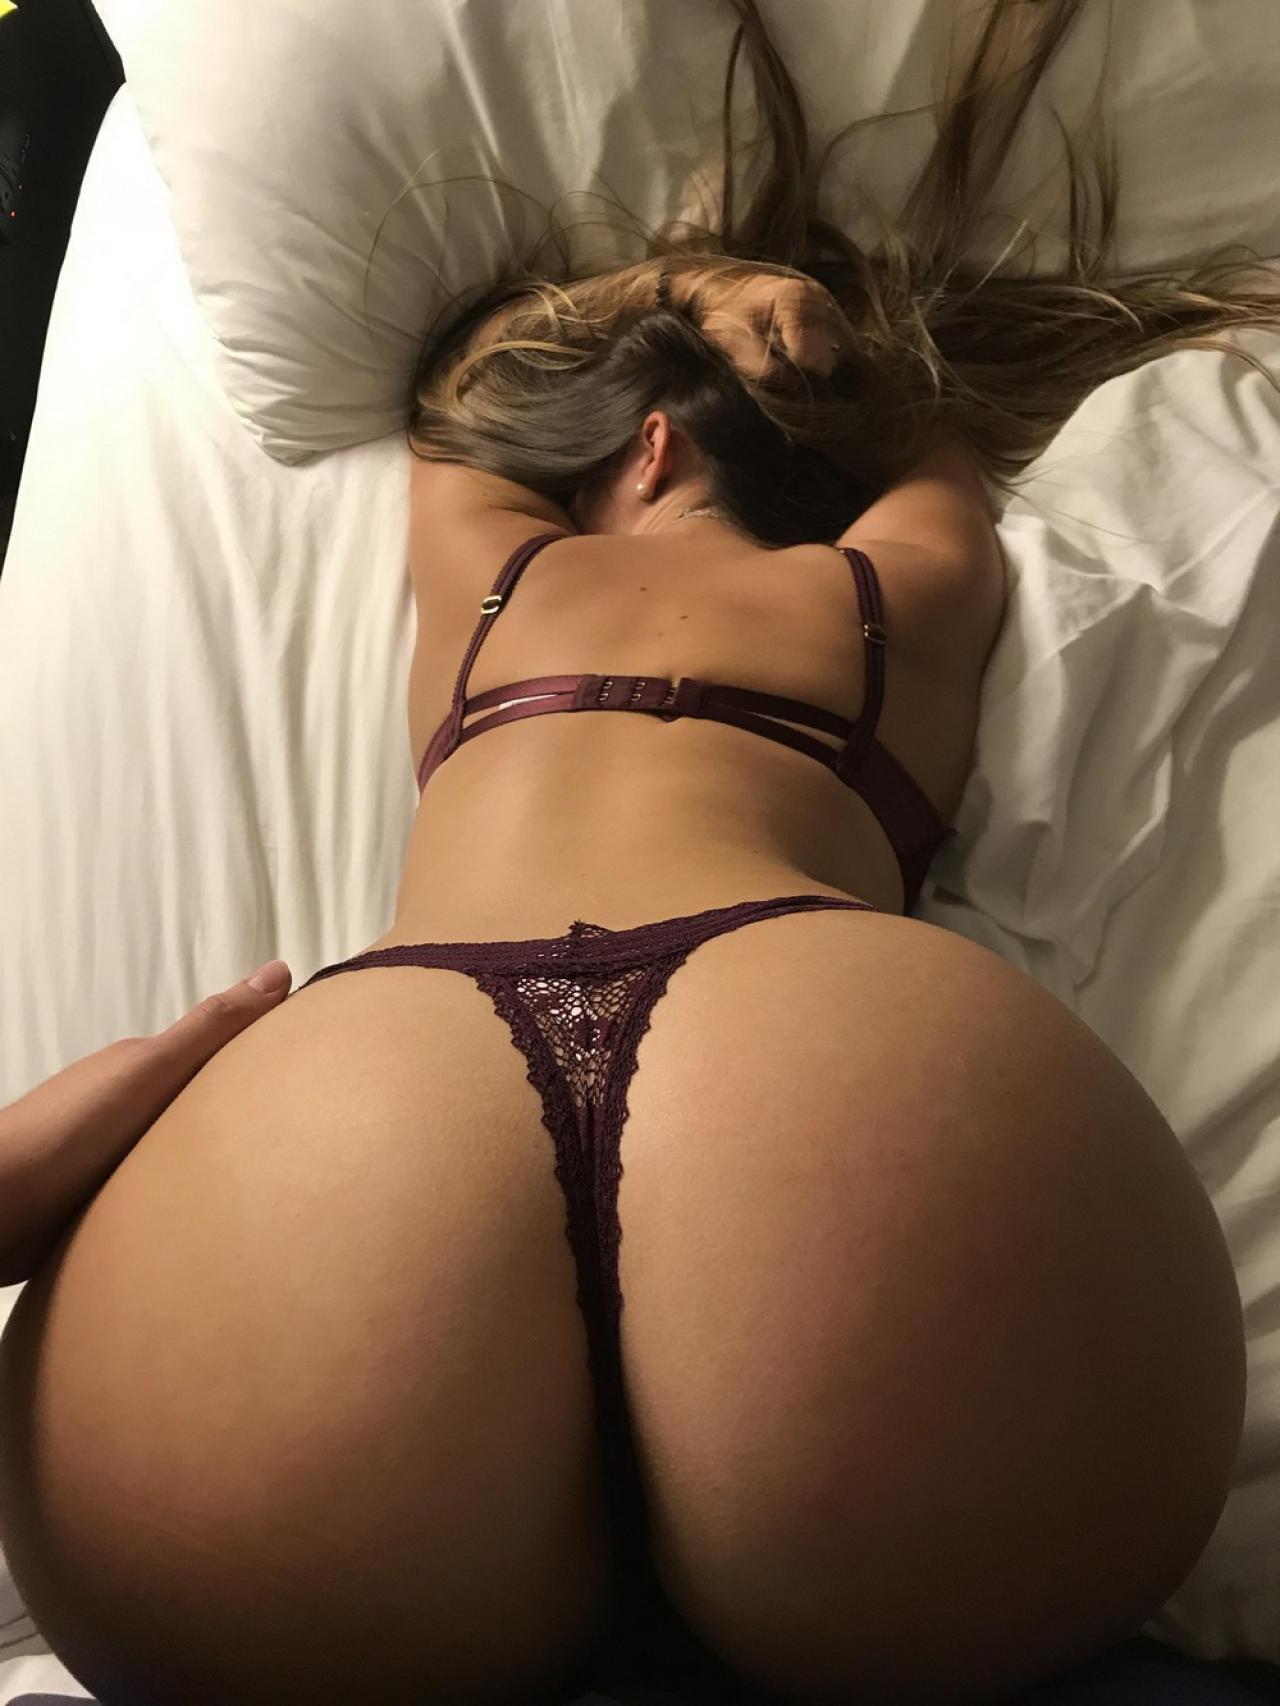 bust bbw self nude pics